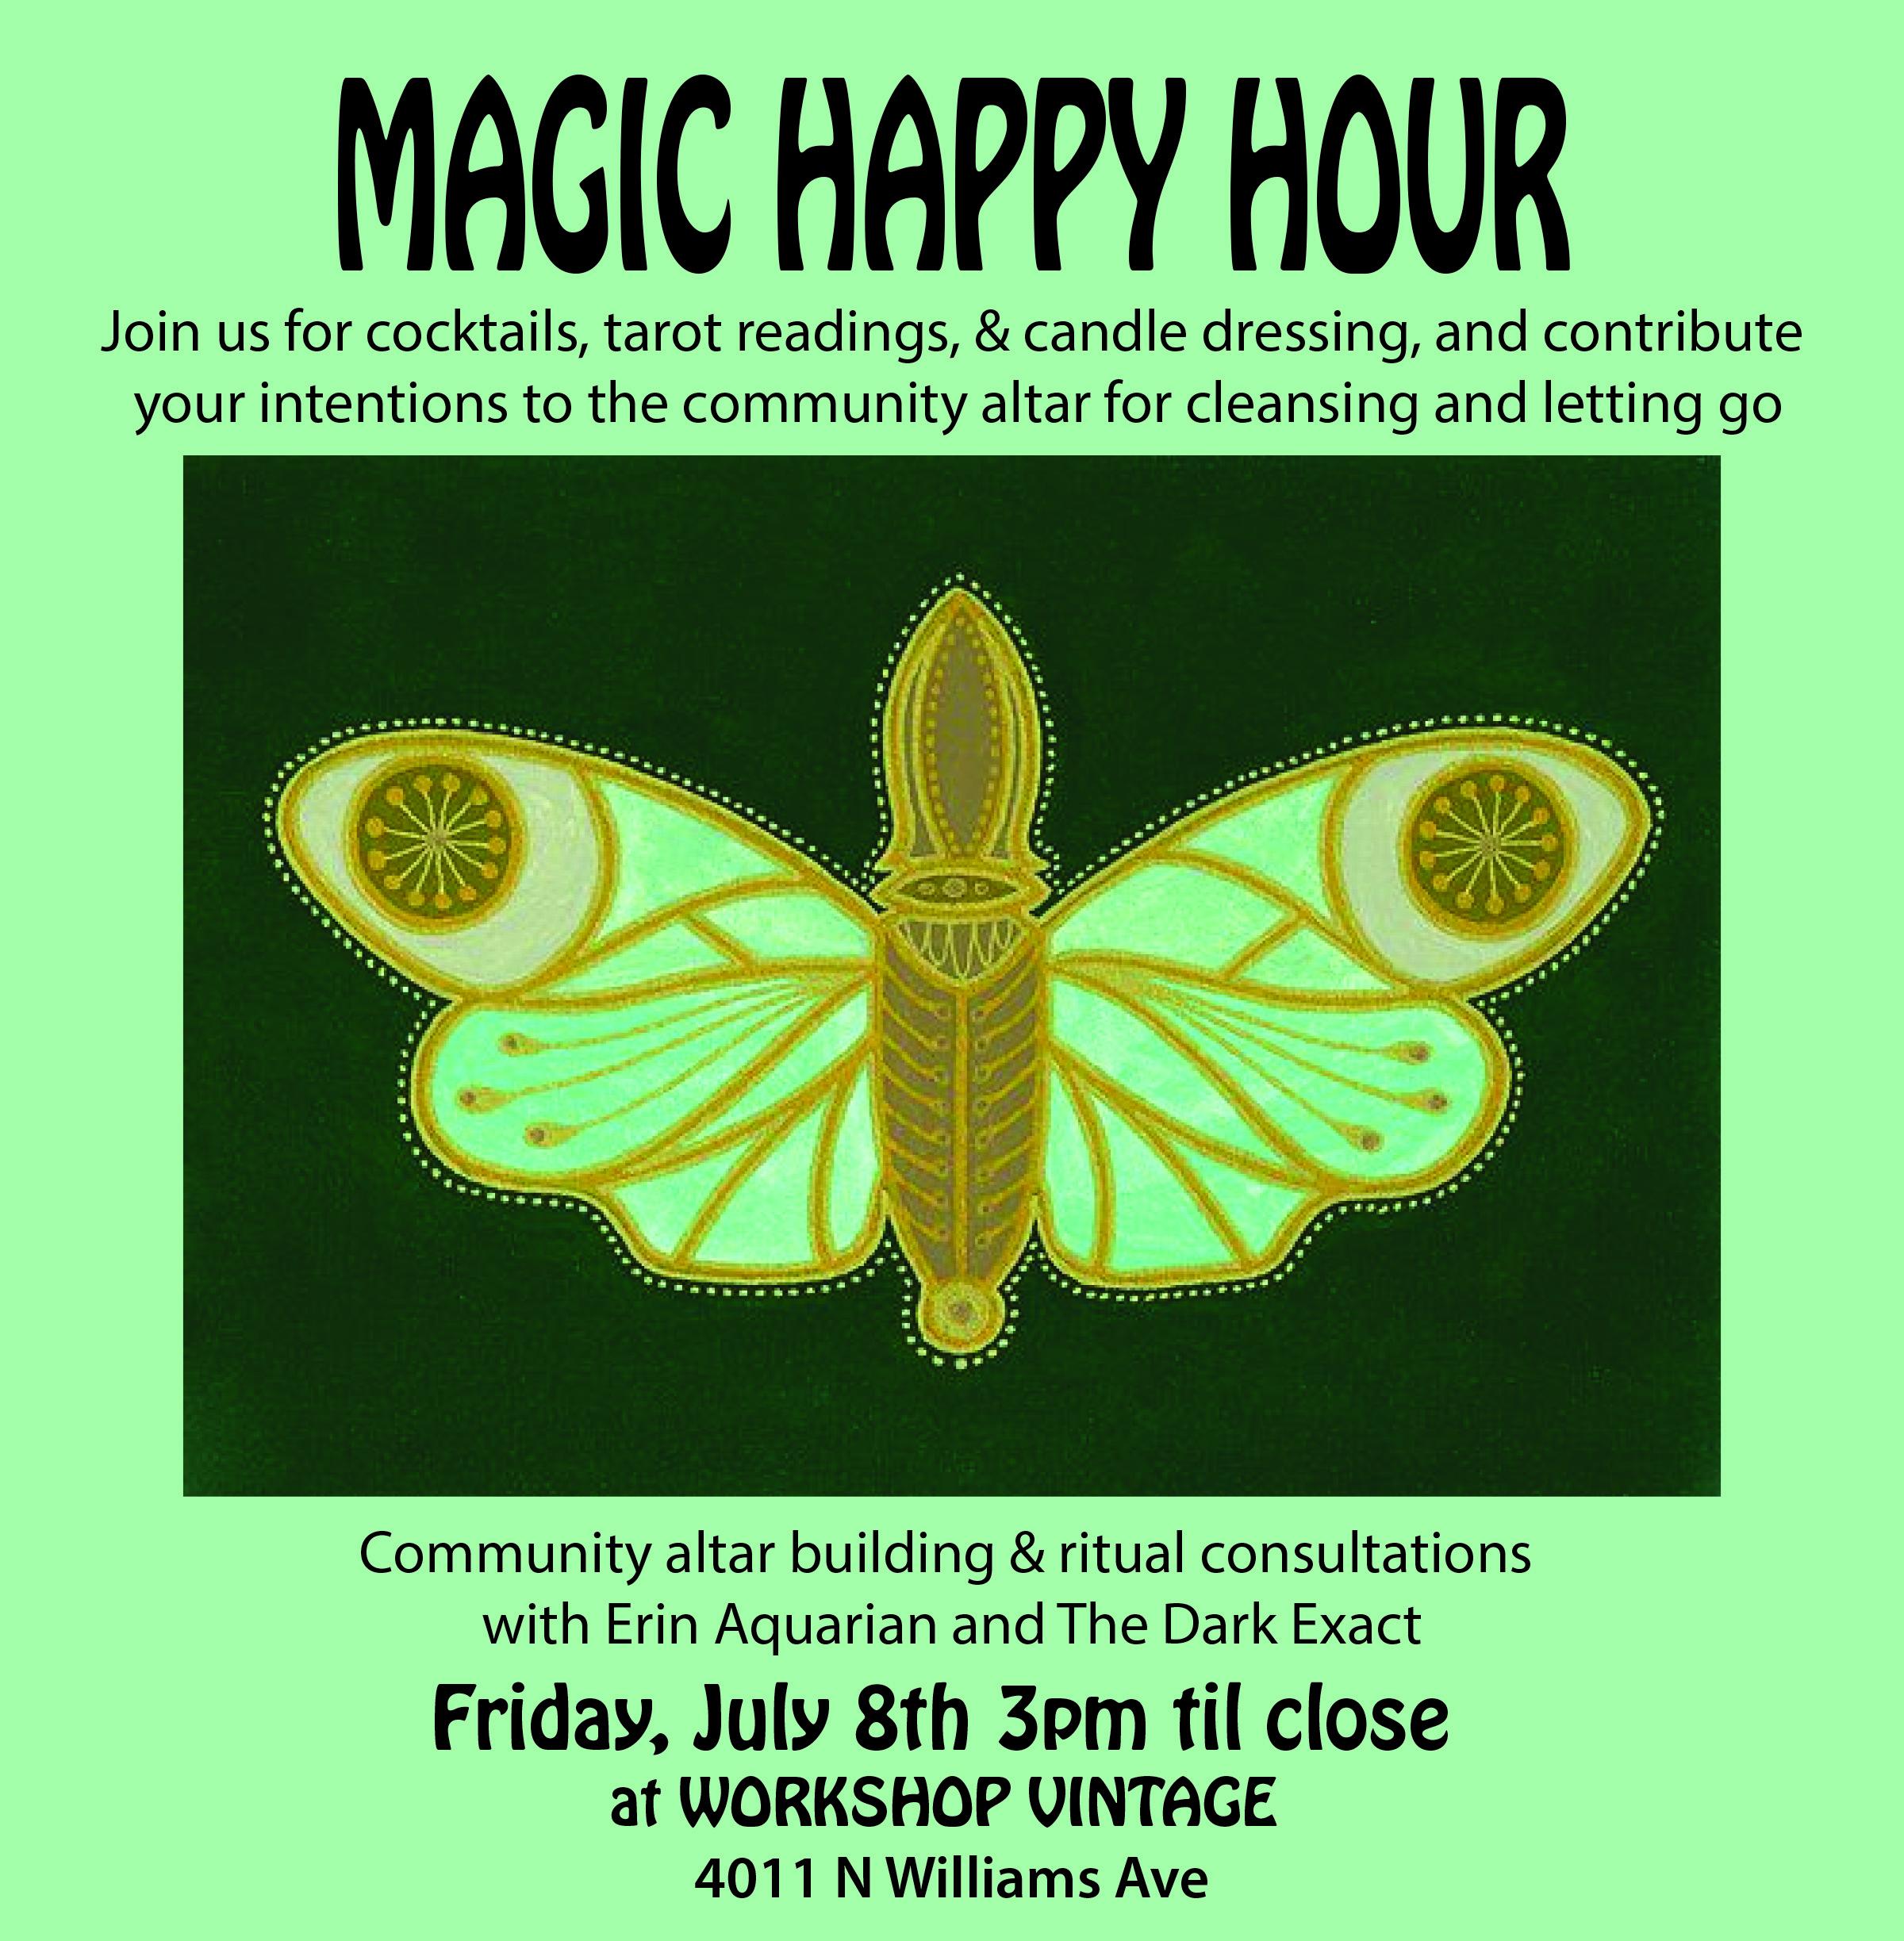 magic hour flyer.jpg